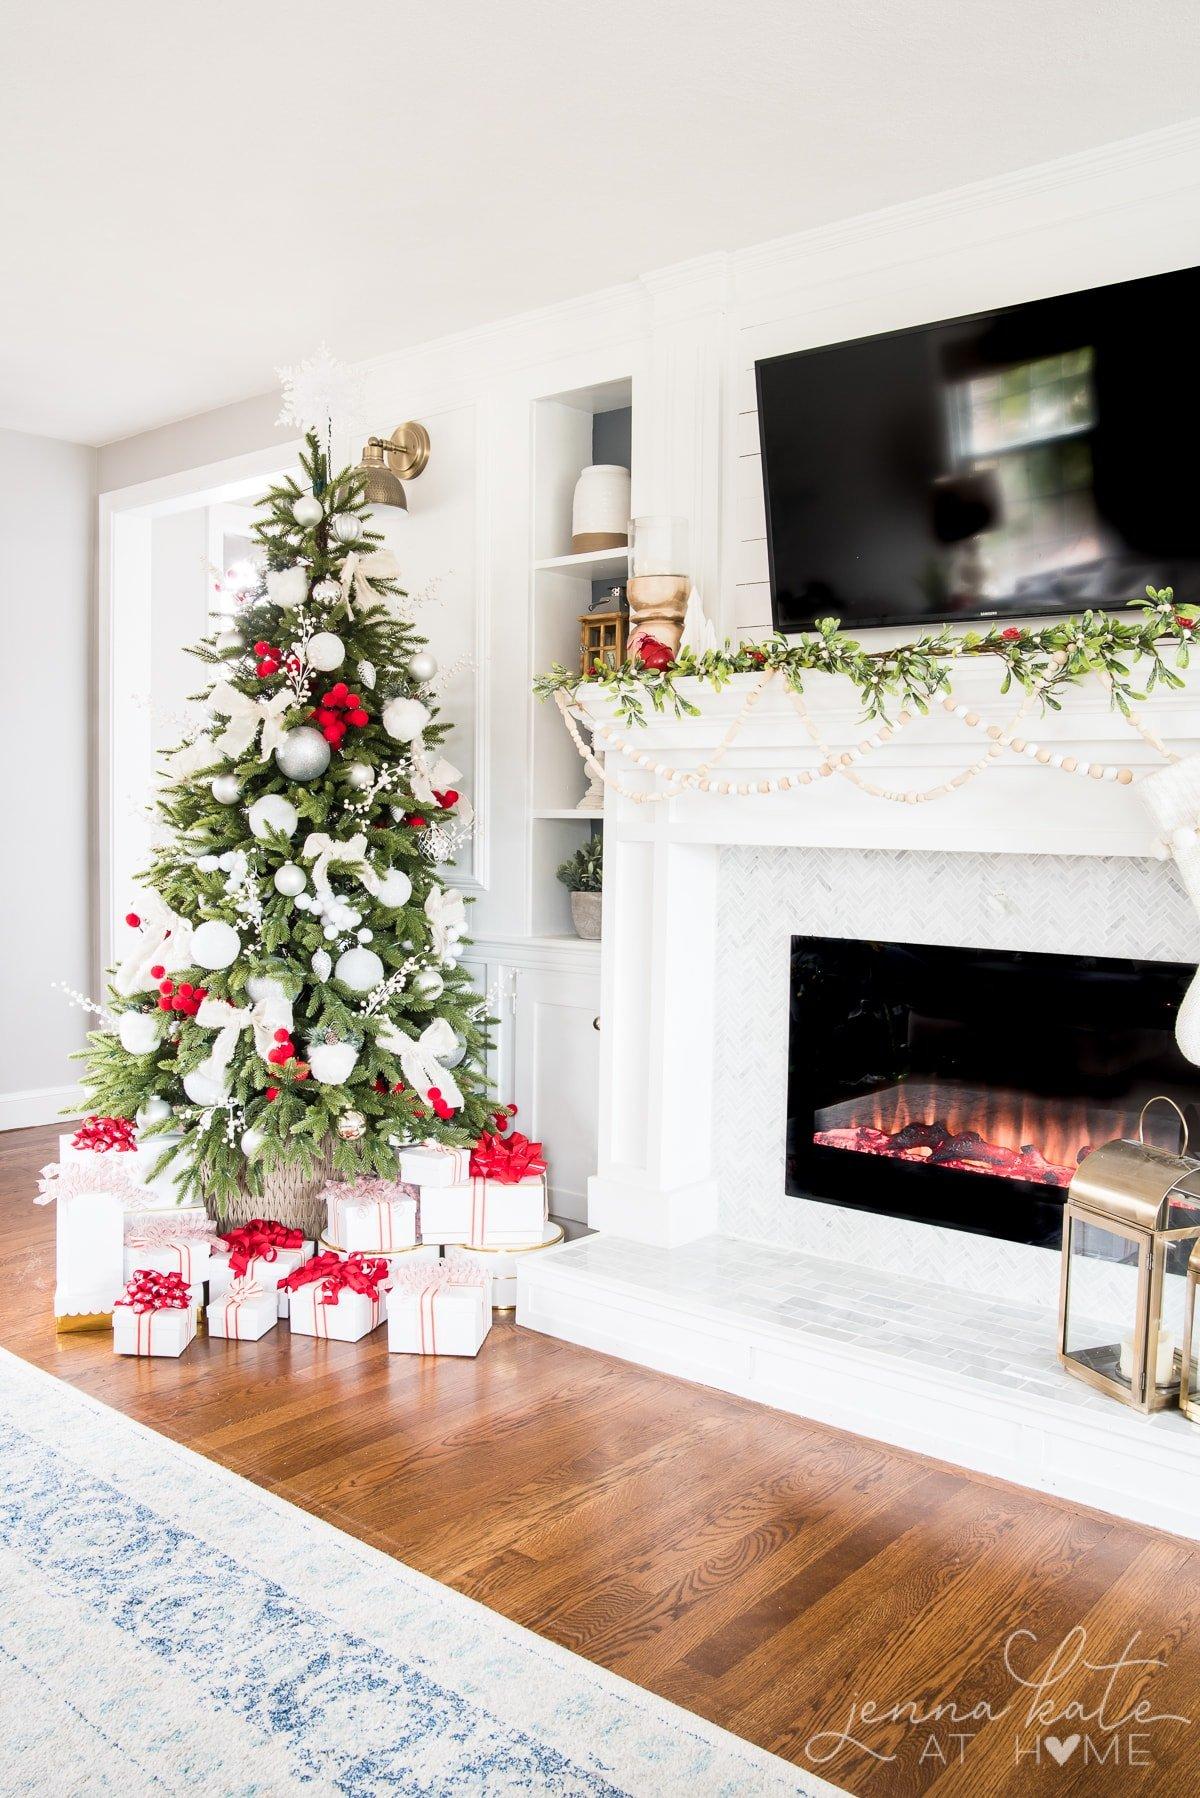 Modern and elegant Christmas mantel with garland